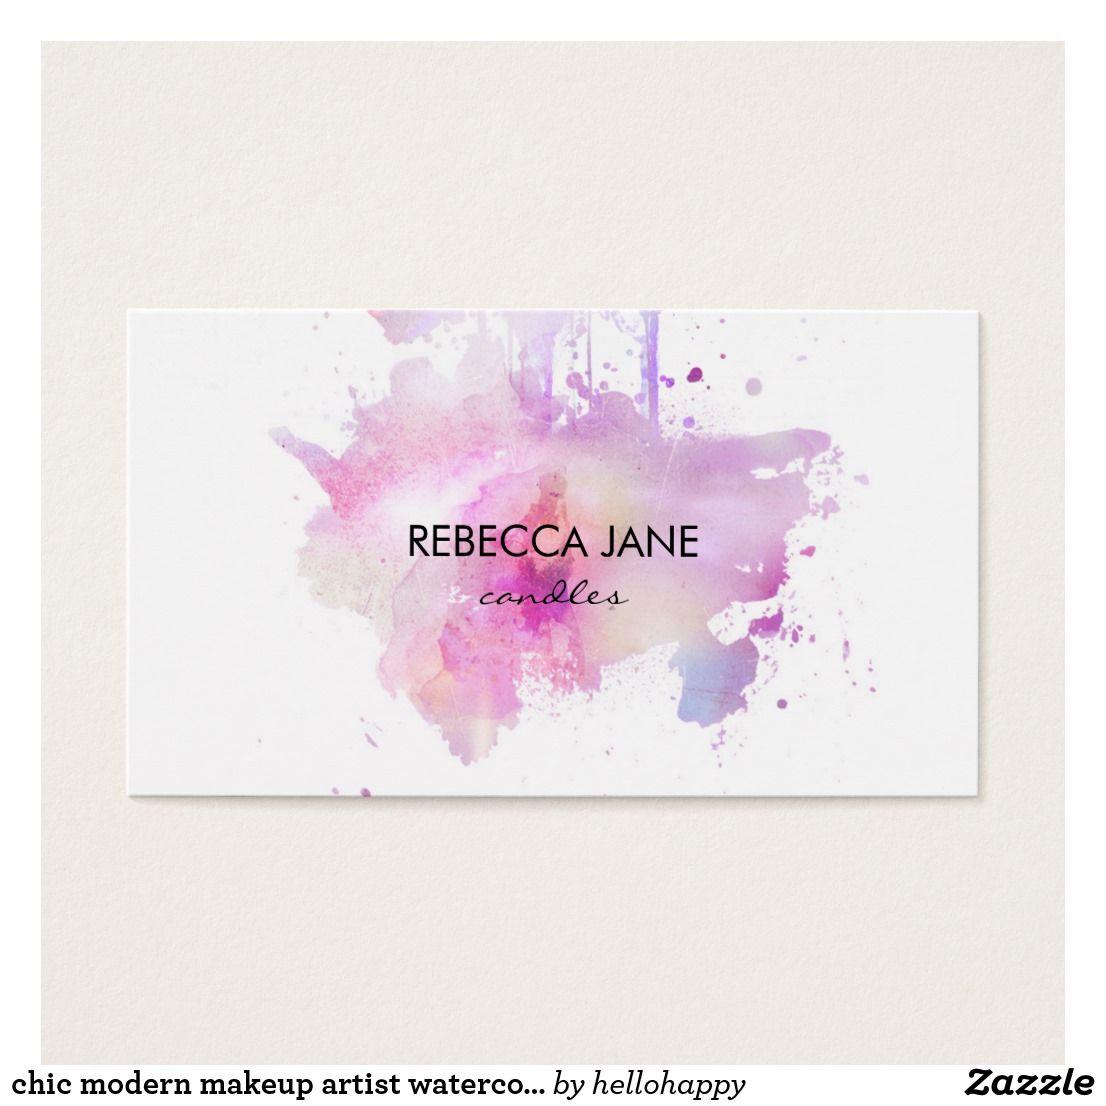 Chic modern makeup artist watercolor purple grunge business card ...